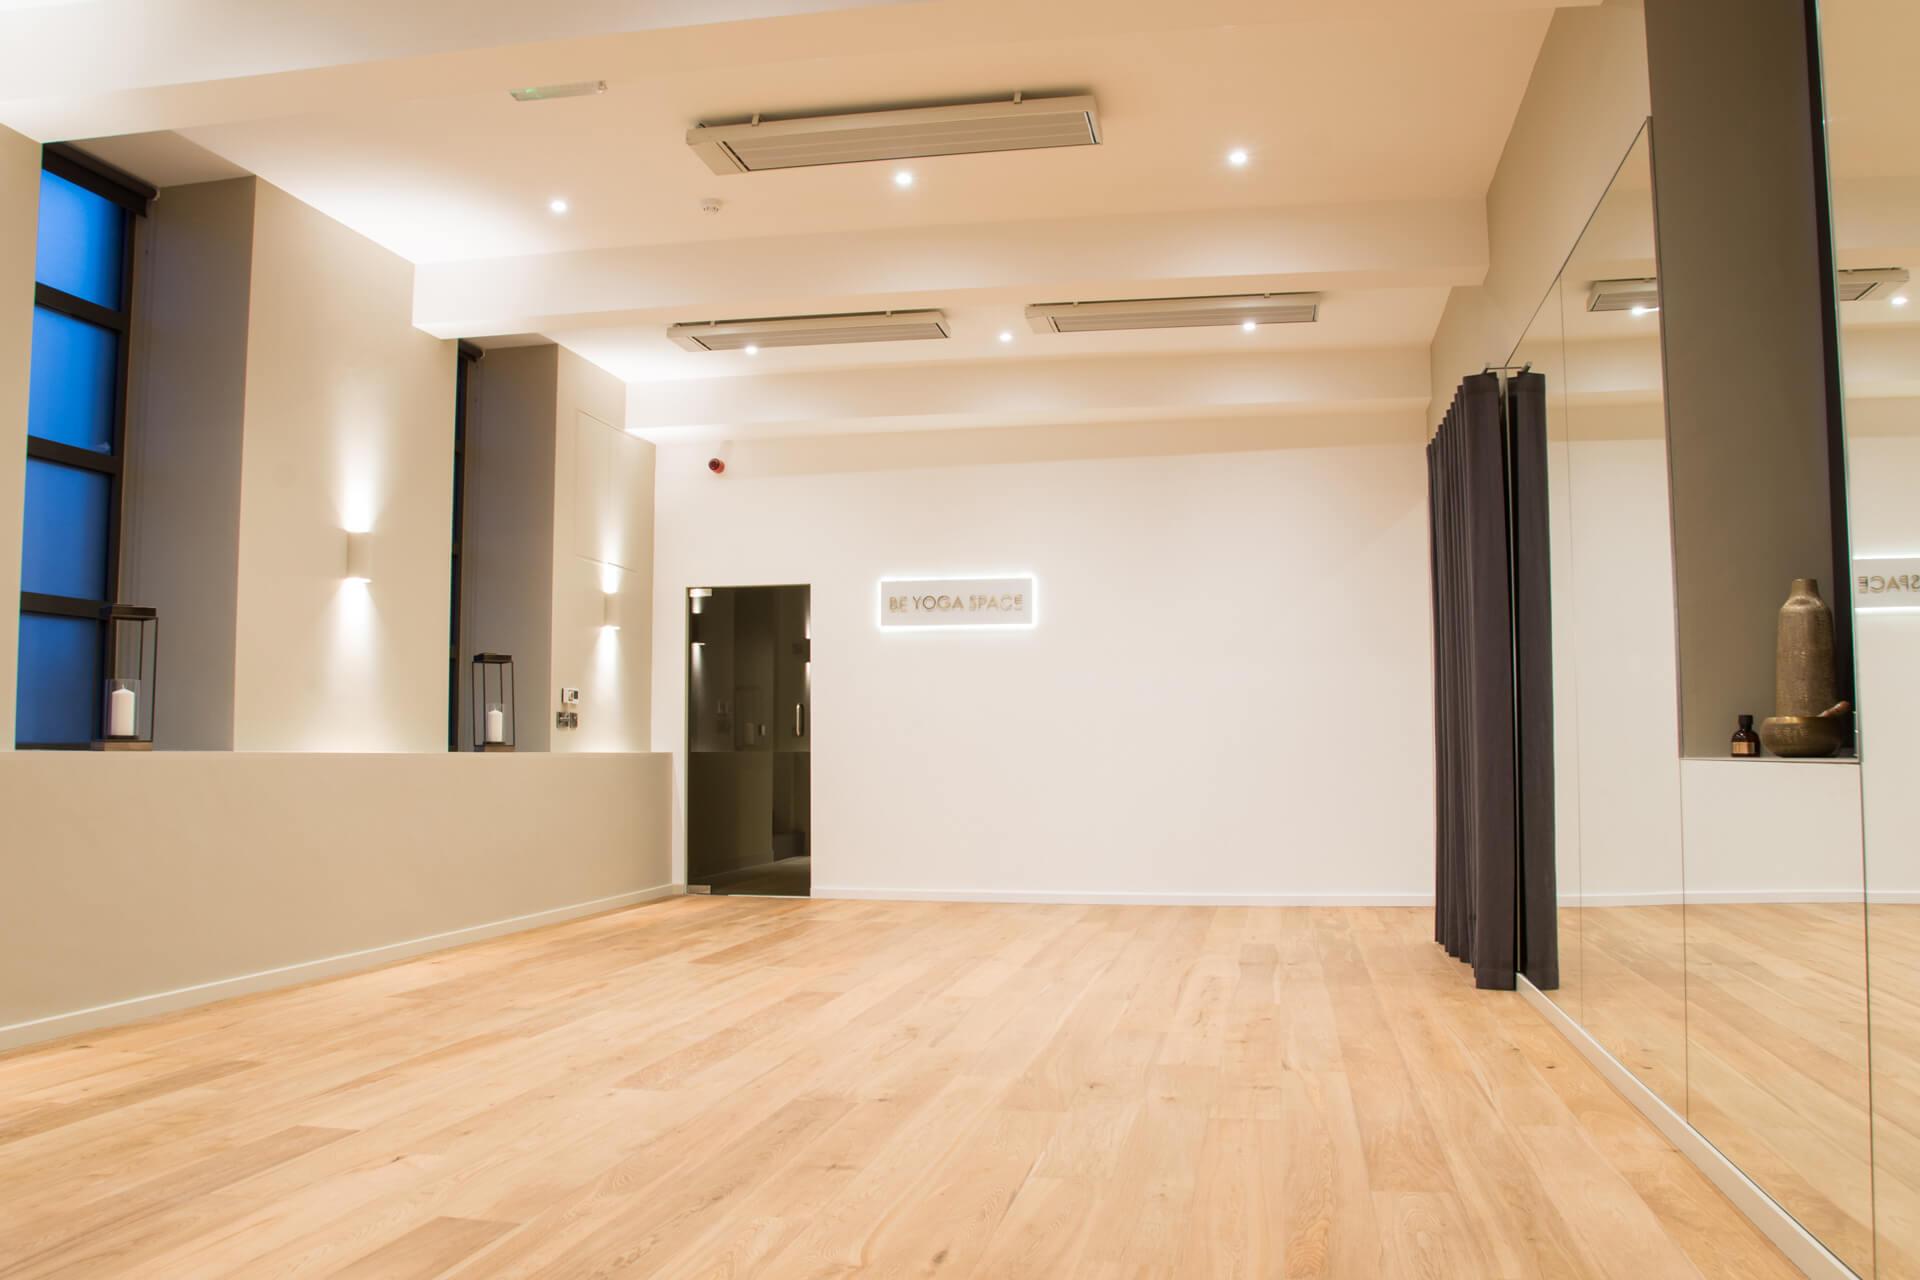 Be Yoga Space hot yoga studio floor